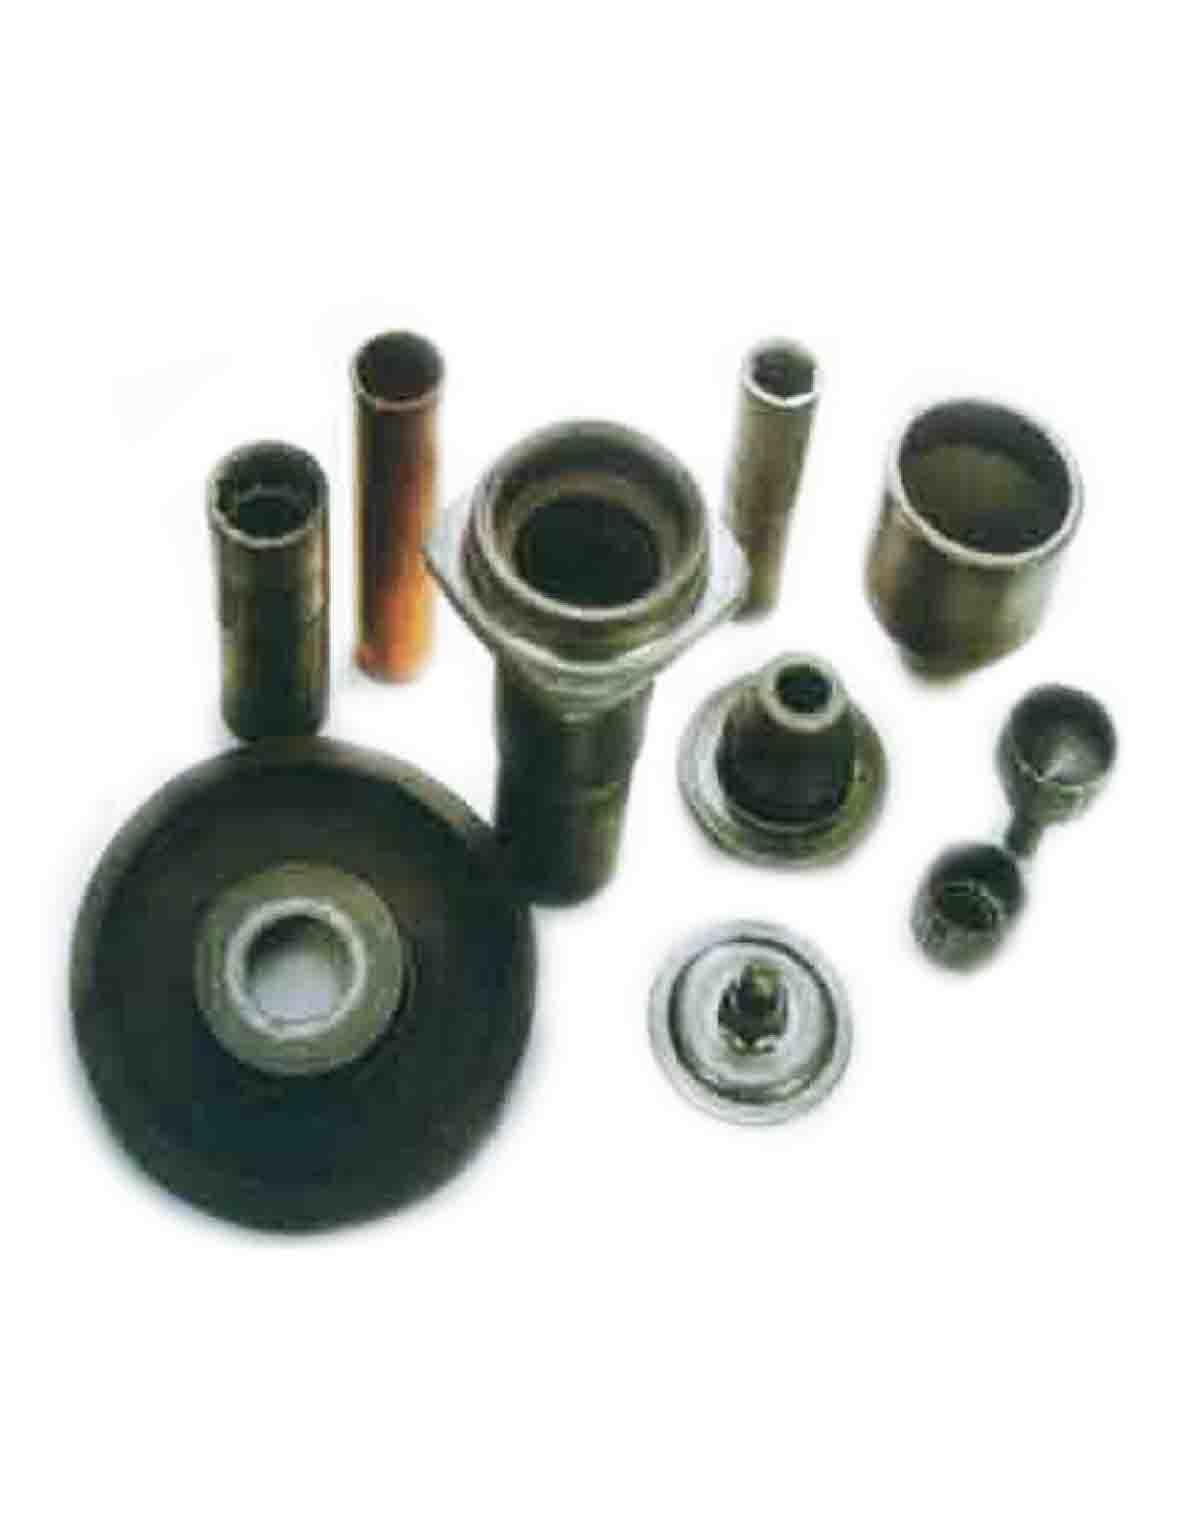 J31-100 closed hot forging press